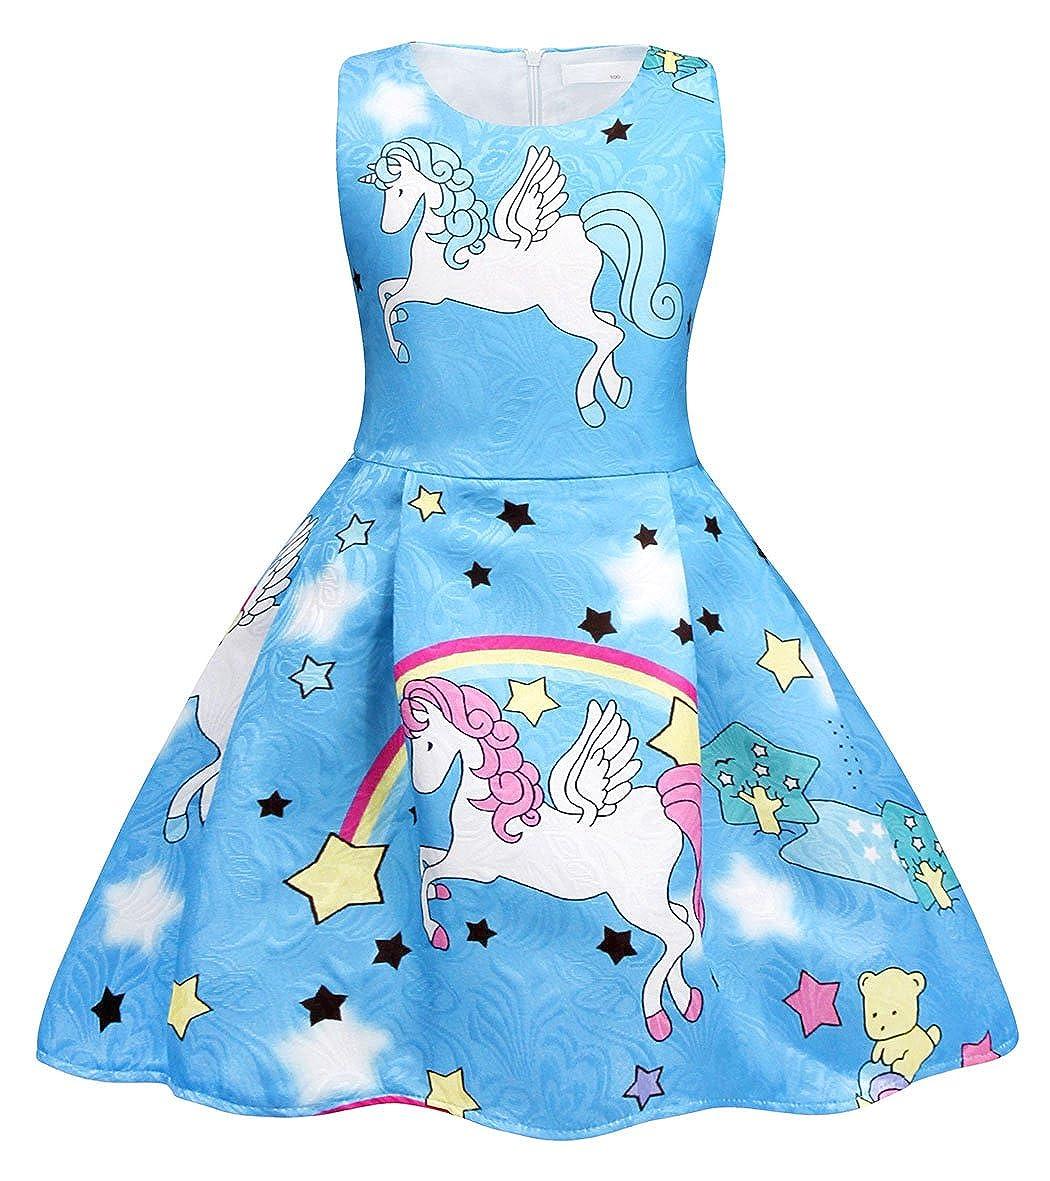 8c13a854f08d Amazon.com  Cotrio Rainbow Unicorn Dress Little Girls Birthday Theme Party  Dresses Toddler Pleated Skirt  Clothing